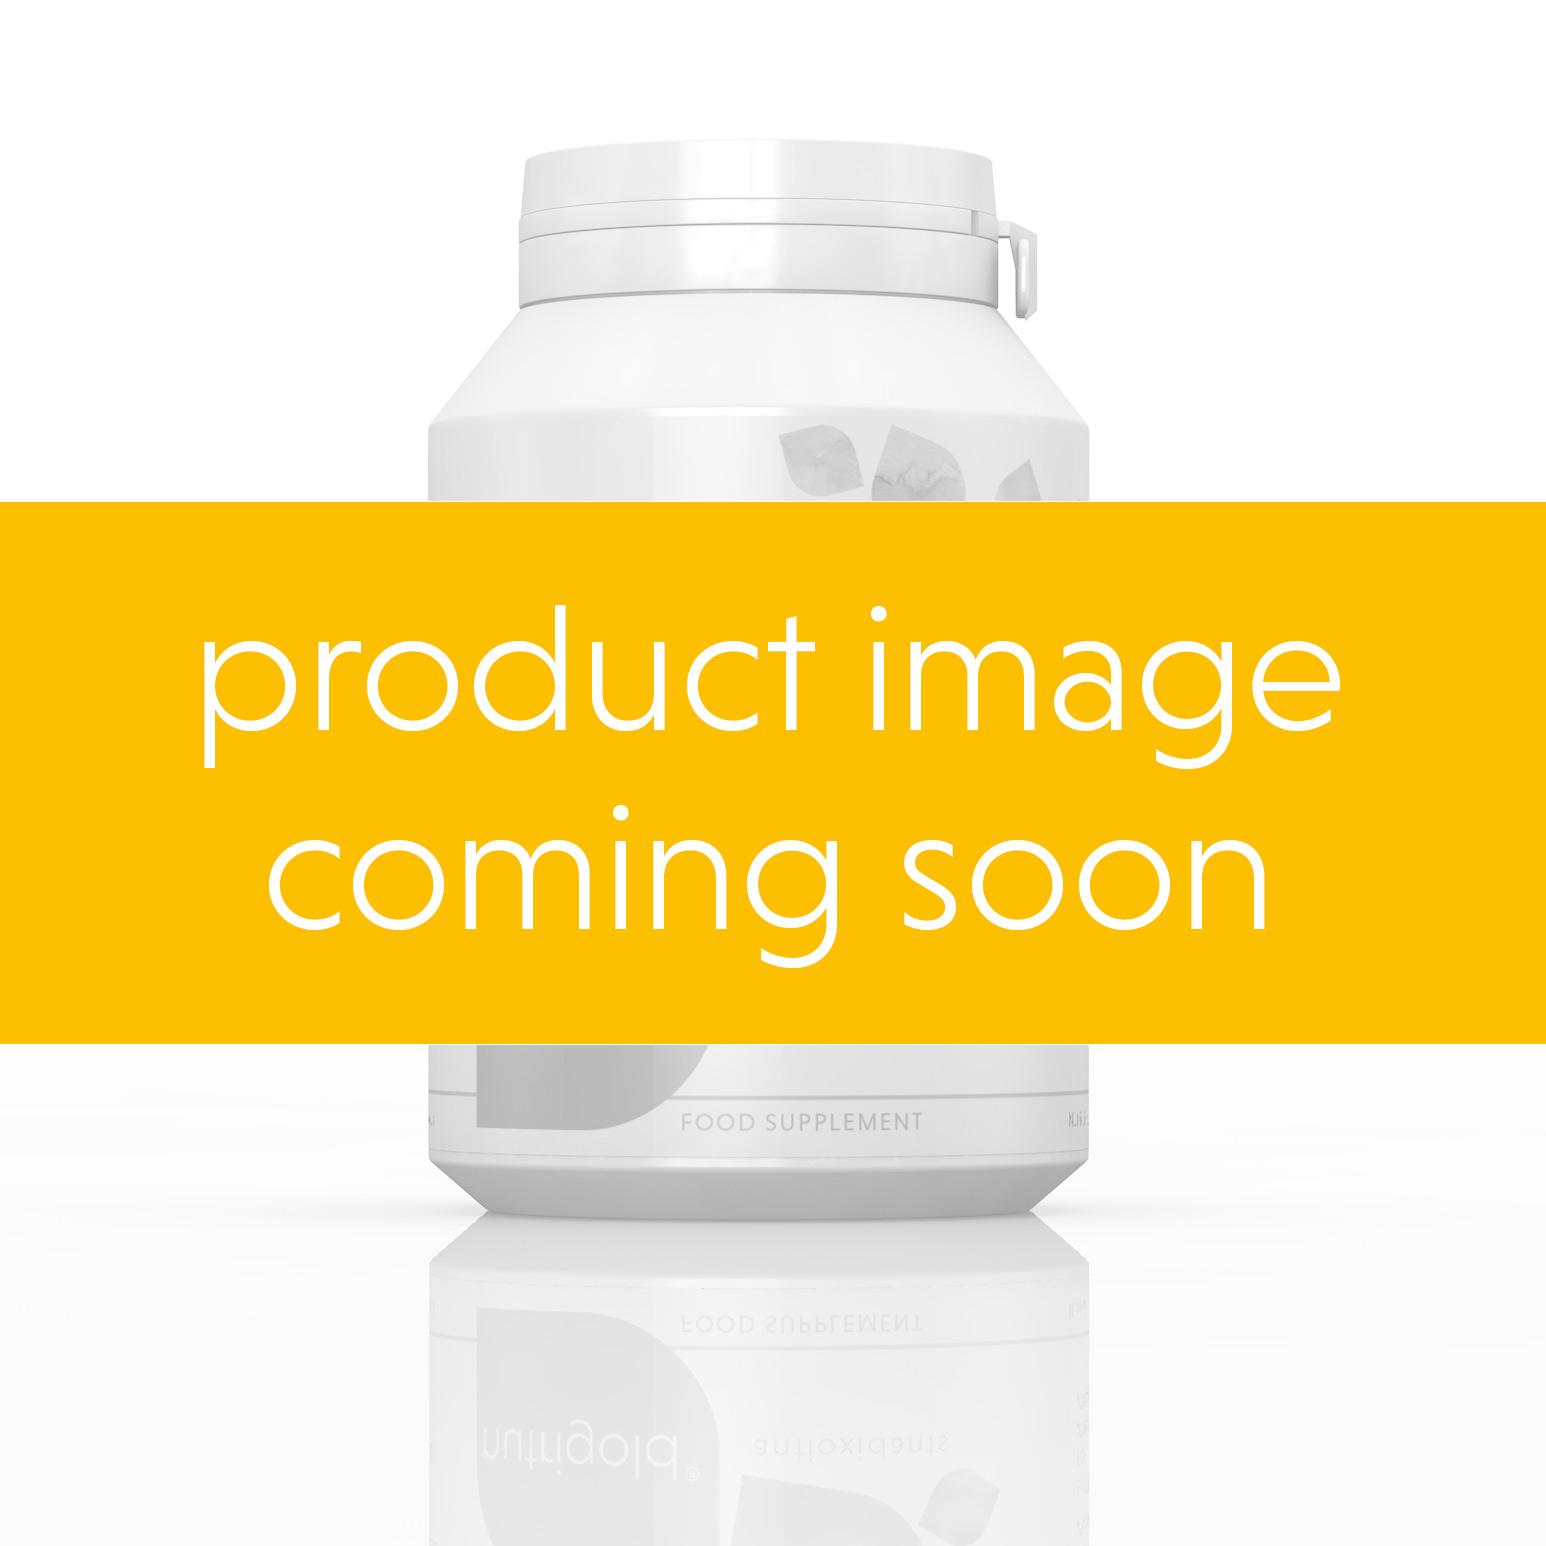 MULTIPACK: Folic Acid MULTIPACK x 3 Pots